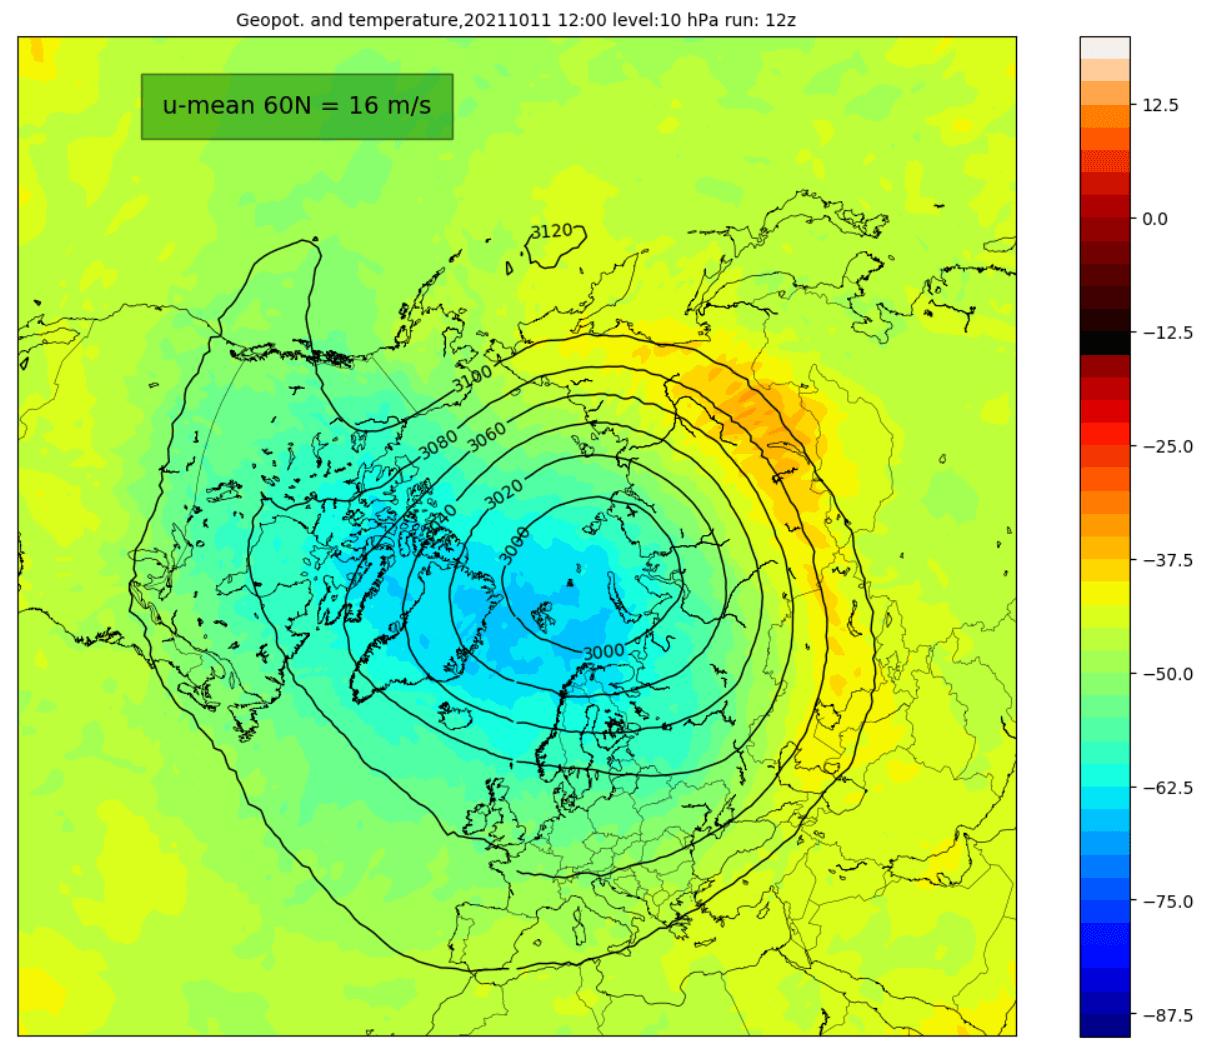 stratospheric-warming-analysis-fall-winter-2021-2022-united-states-europe